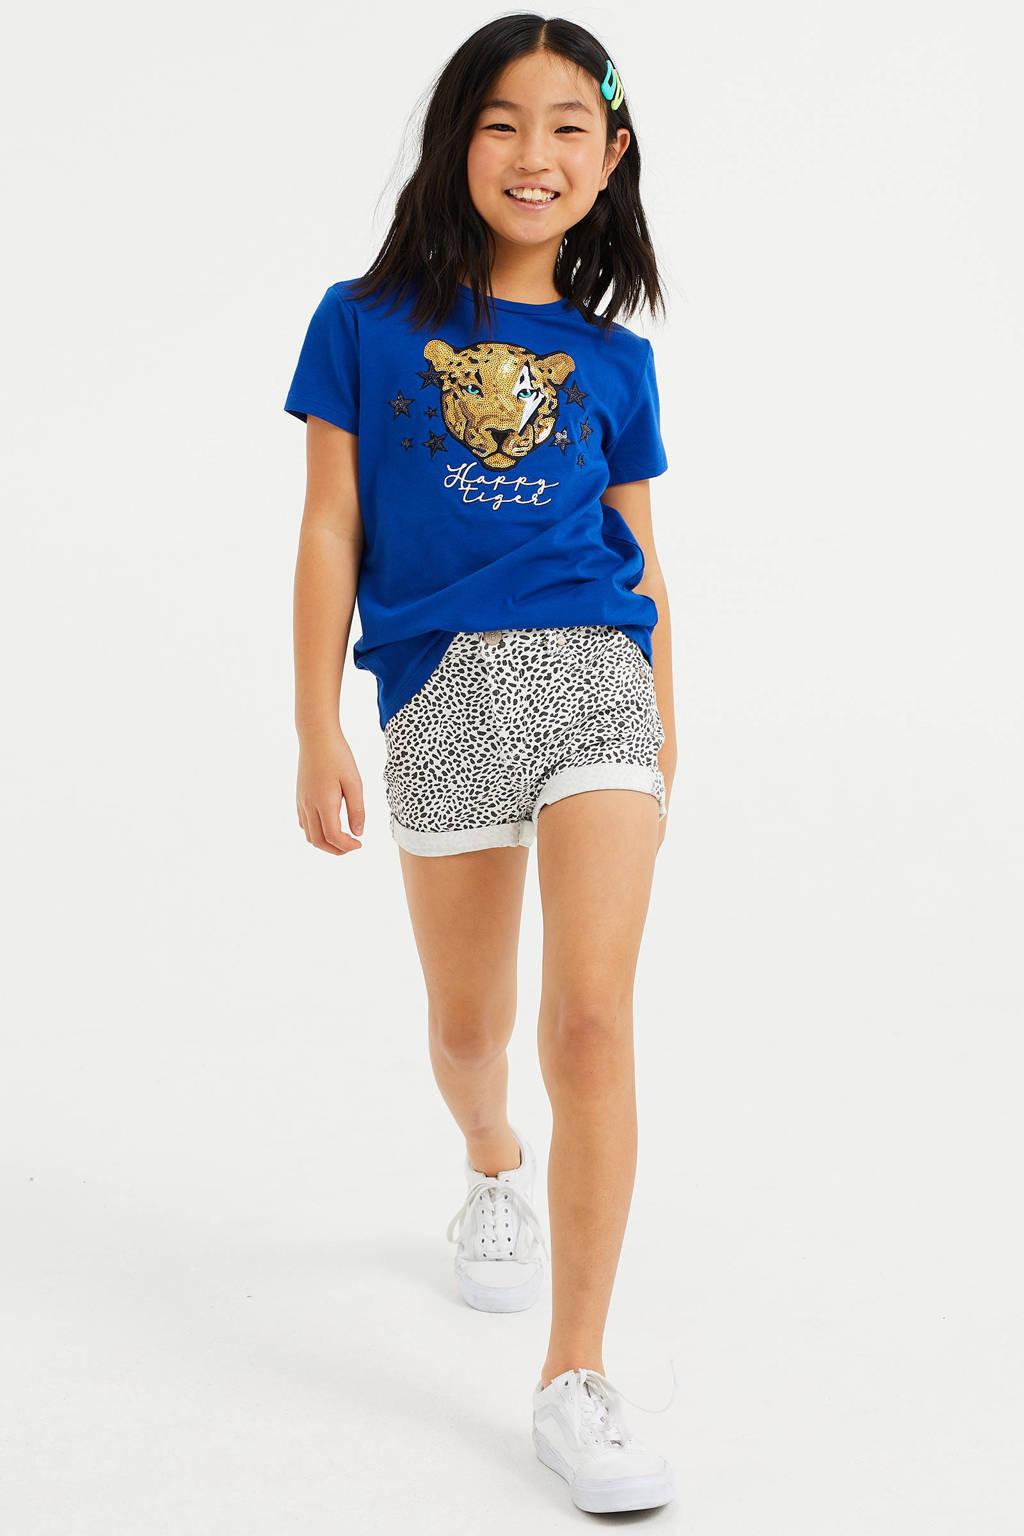 WE Fashion T-shirt met printopdruk en pailletten blauw/goud/zwart, Blauw/goud/zwart